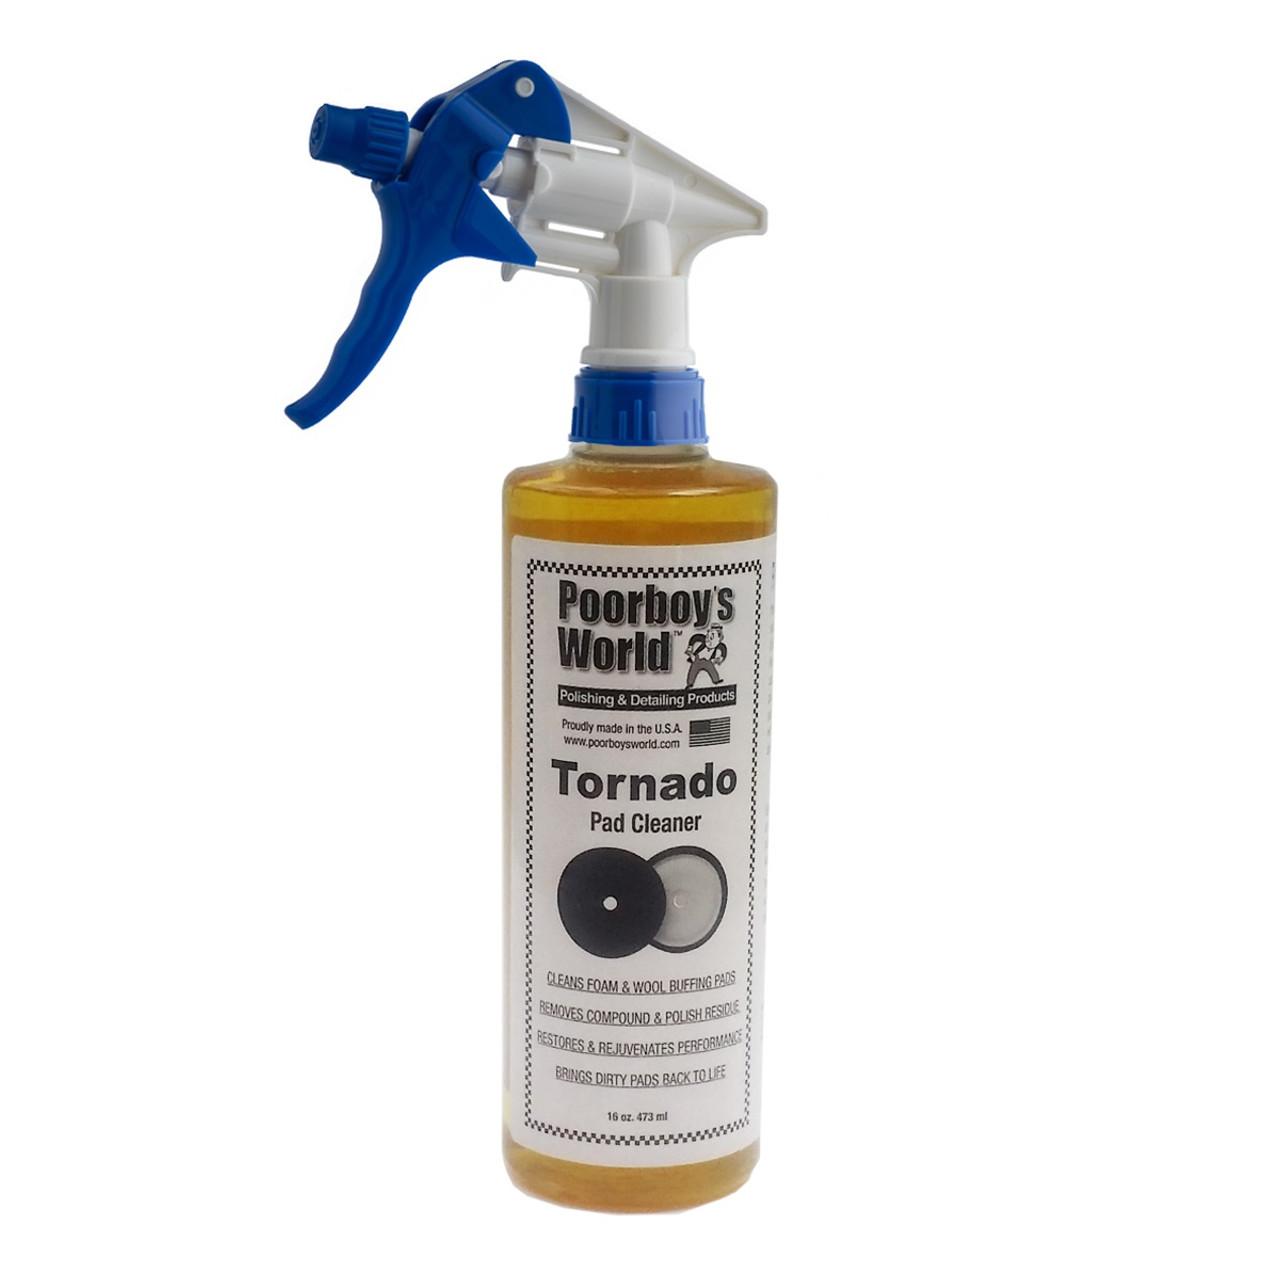 Poorboy's World Tornado Pad Cleaner 16oz w/Sprayer